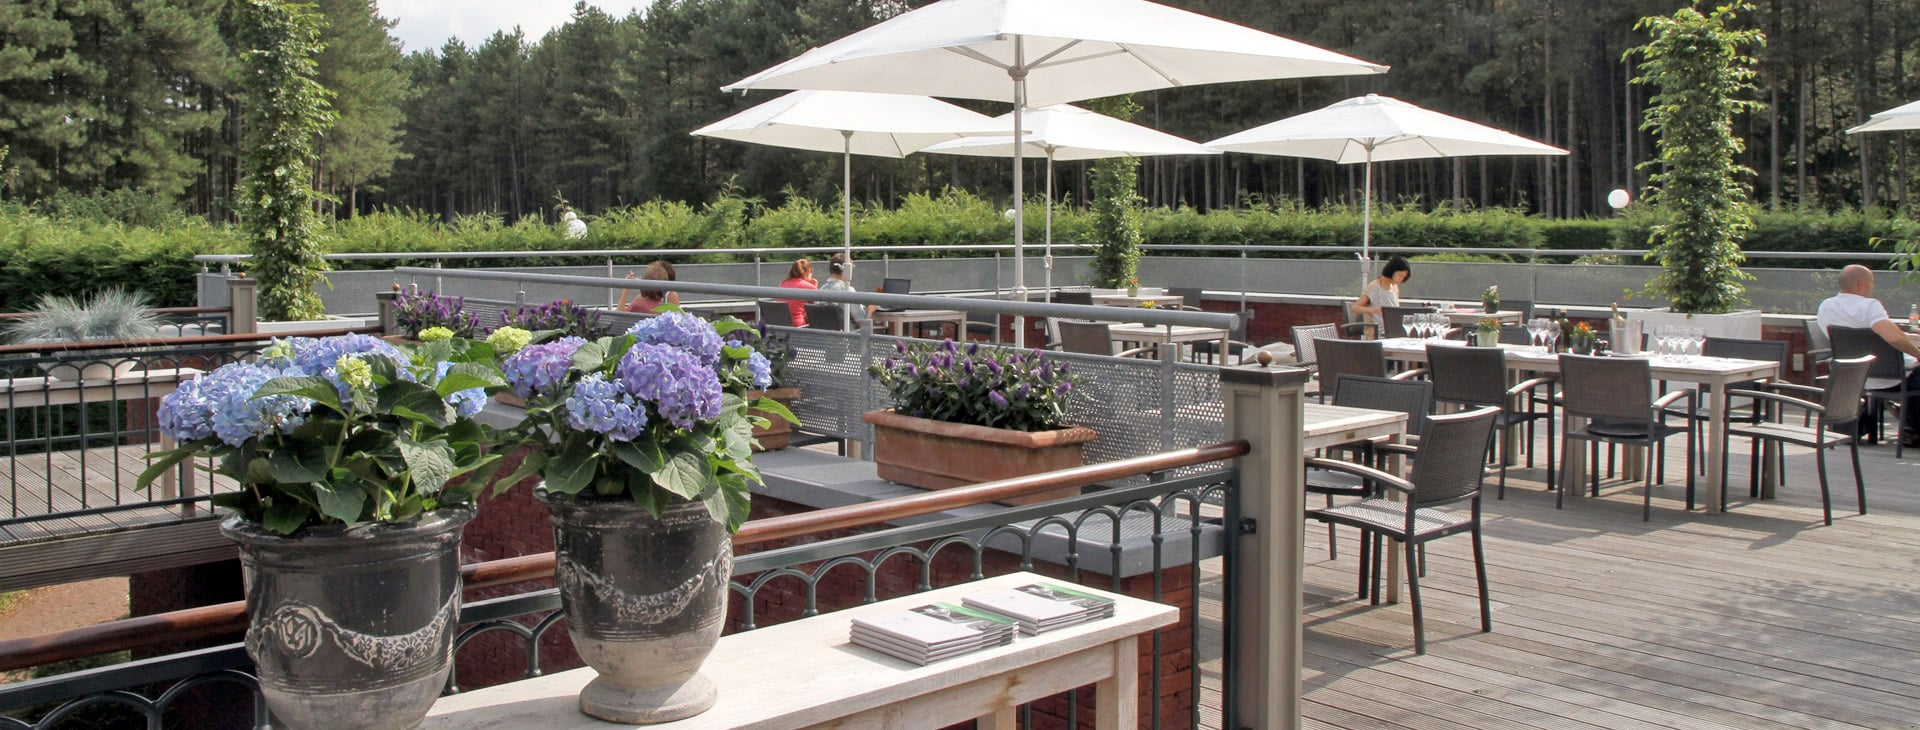 hotel-stiemerheide-IMG_2954